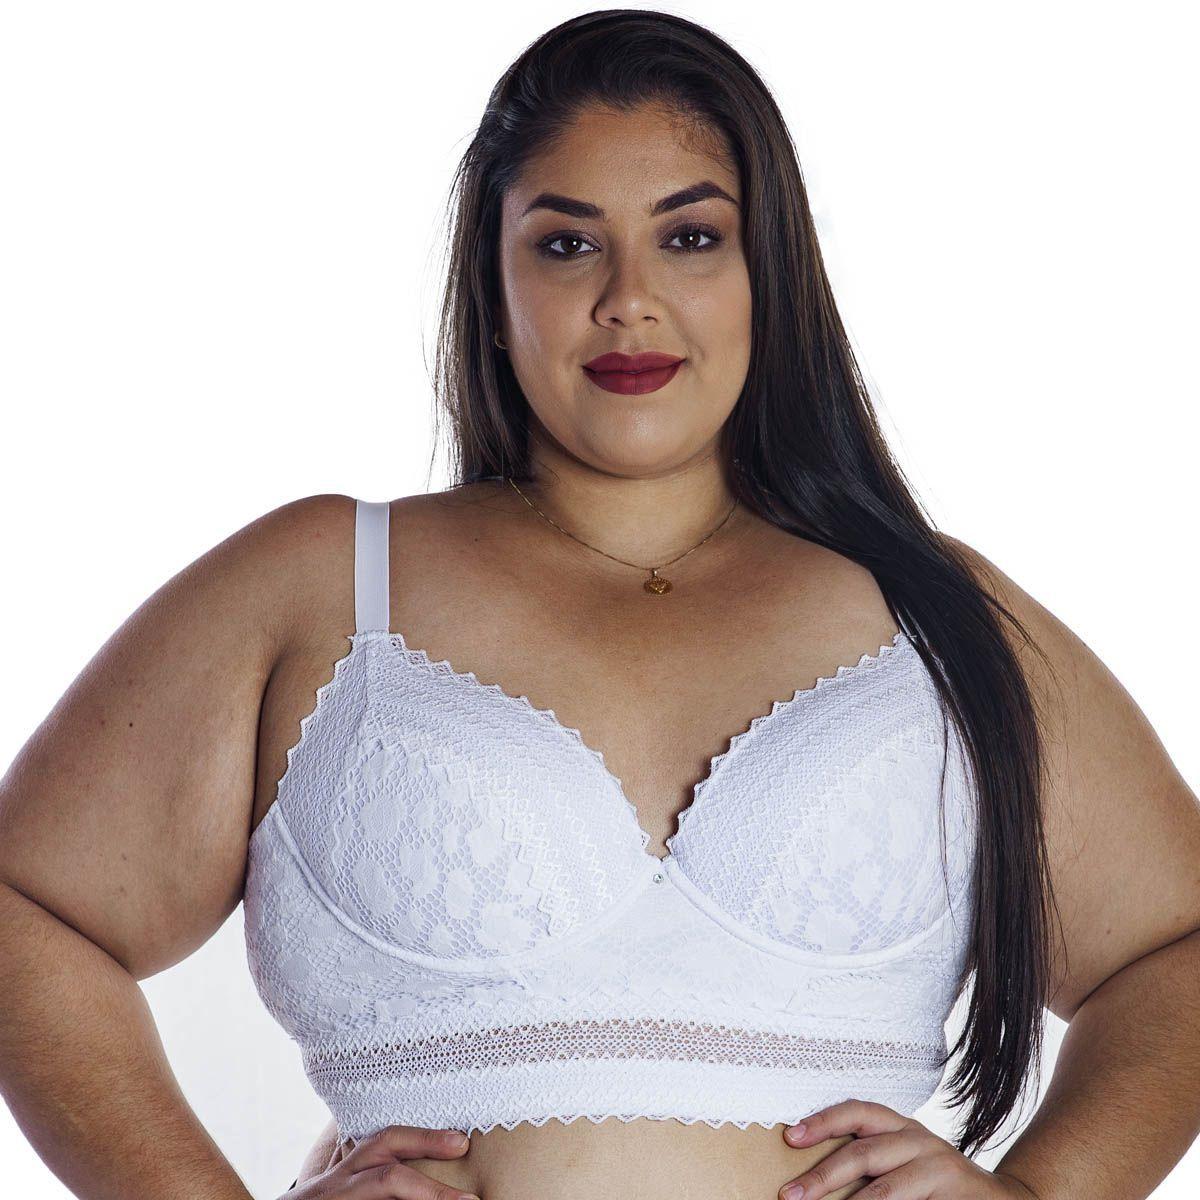 Sutiã Plus Size Corpete Linha Única Nayane Rodrigues